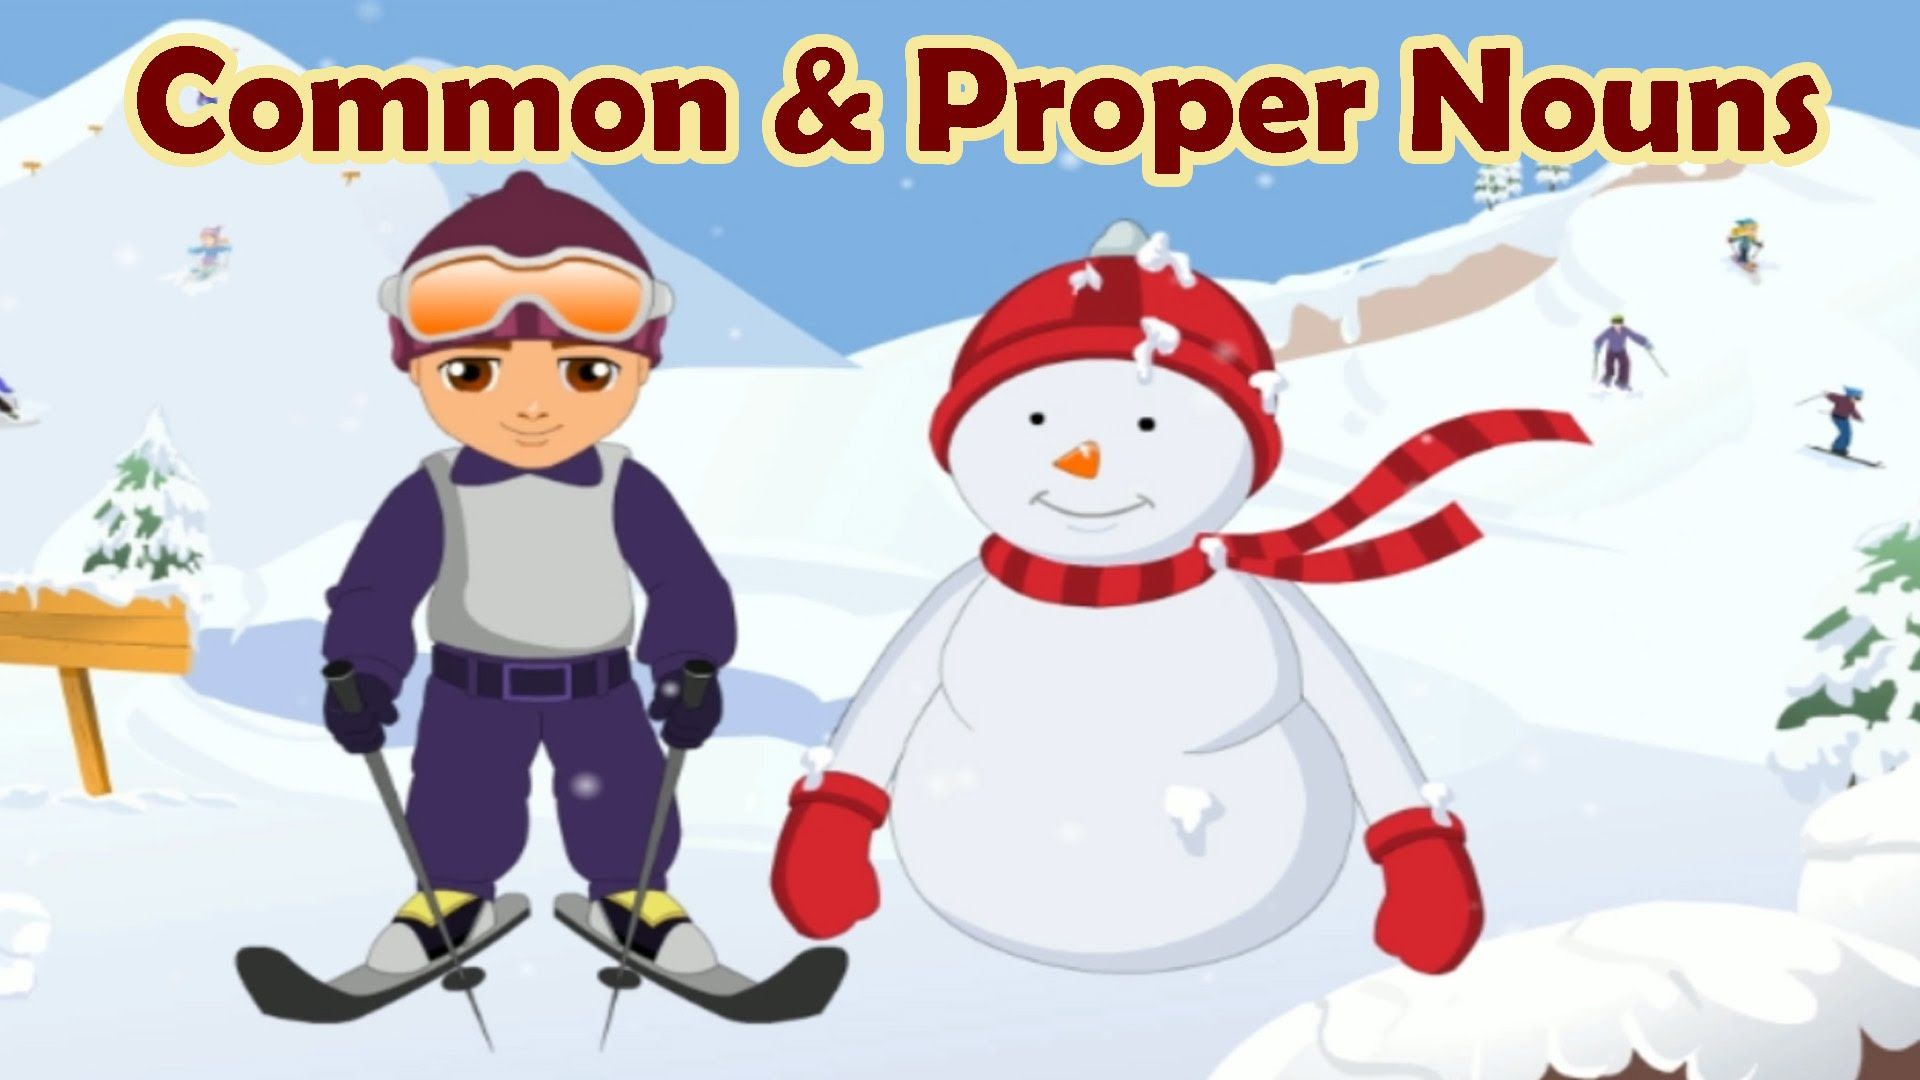 Come Ski Down Noun Mountain With Mr Mogul He Will Help You Identify Proper And Common Nouns